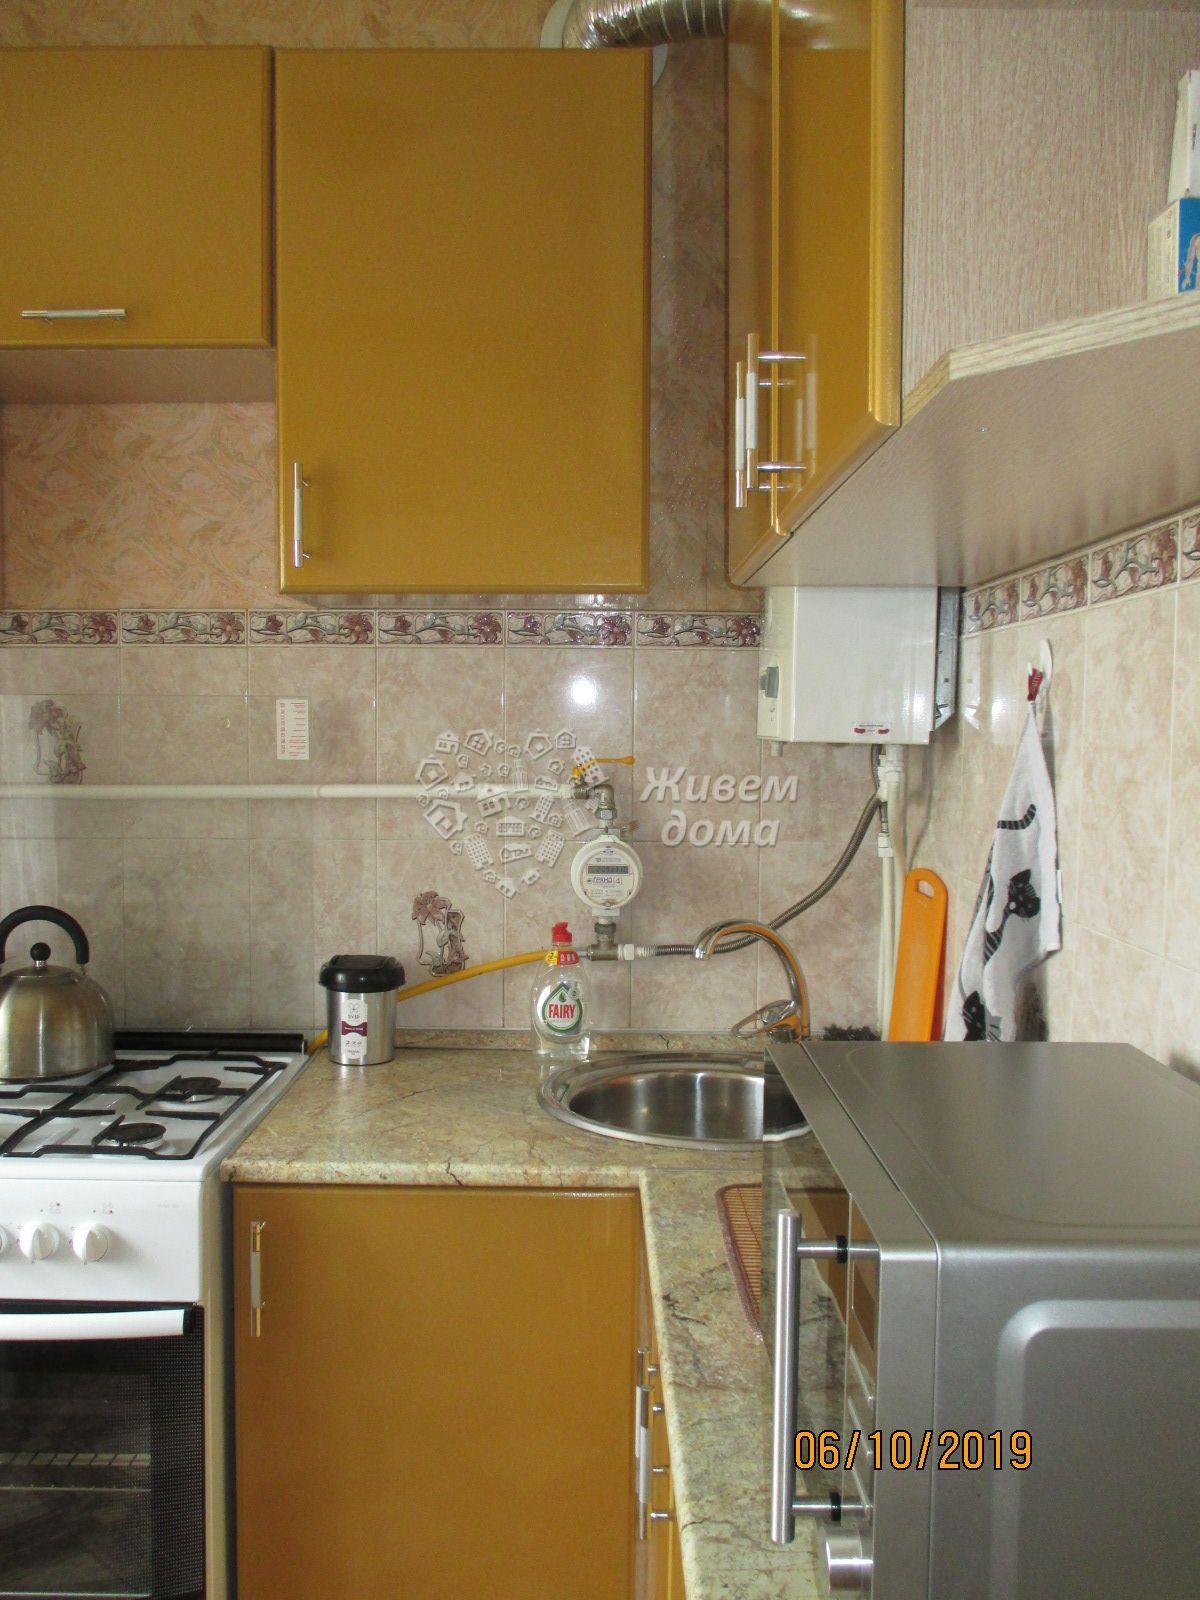 Квартира на продажу по адресу Россия, Волгоградская область, Волгоград, Мясникова ул, 4